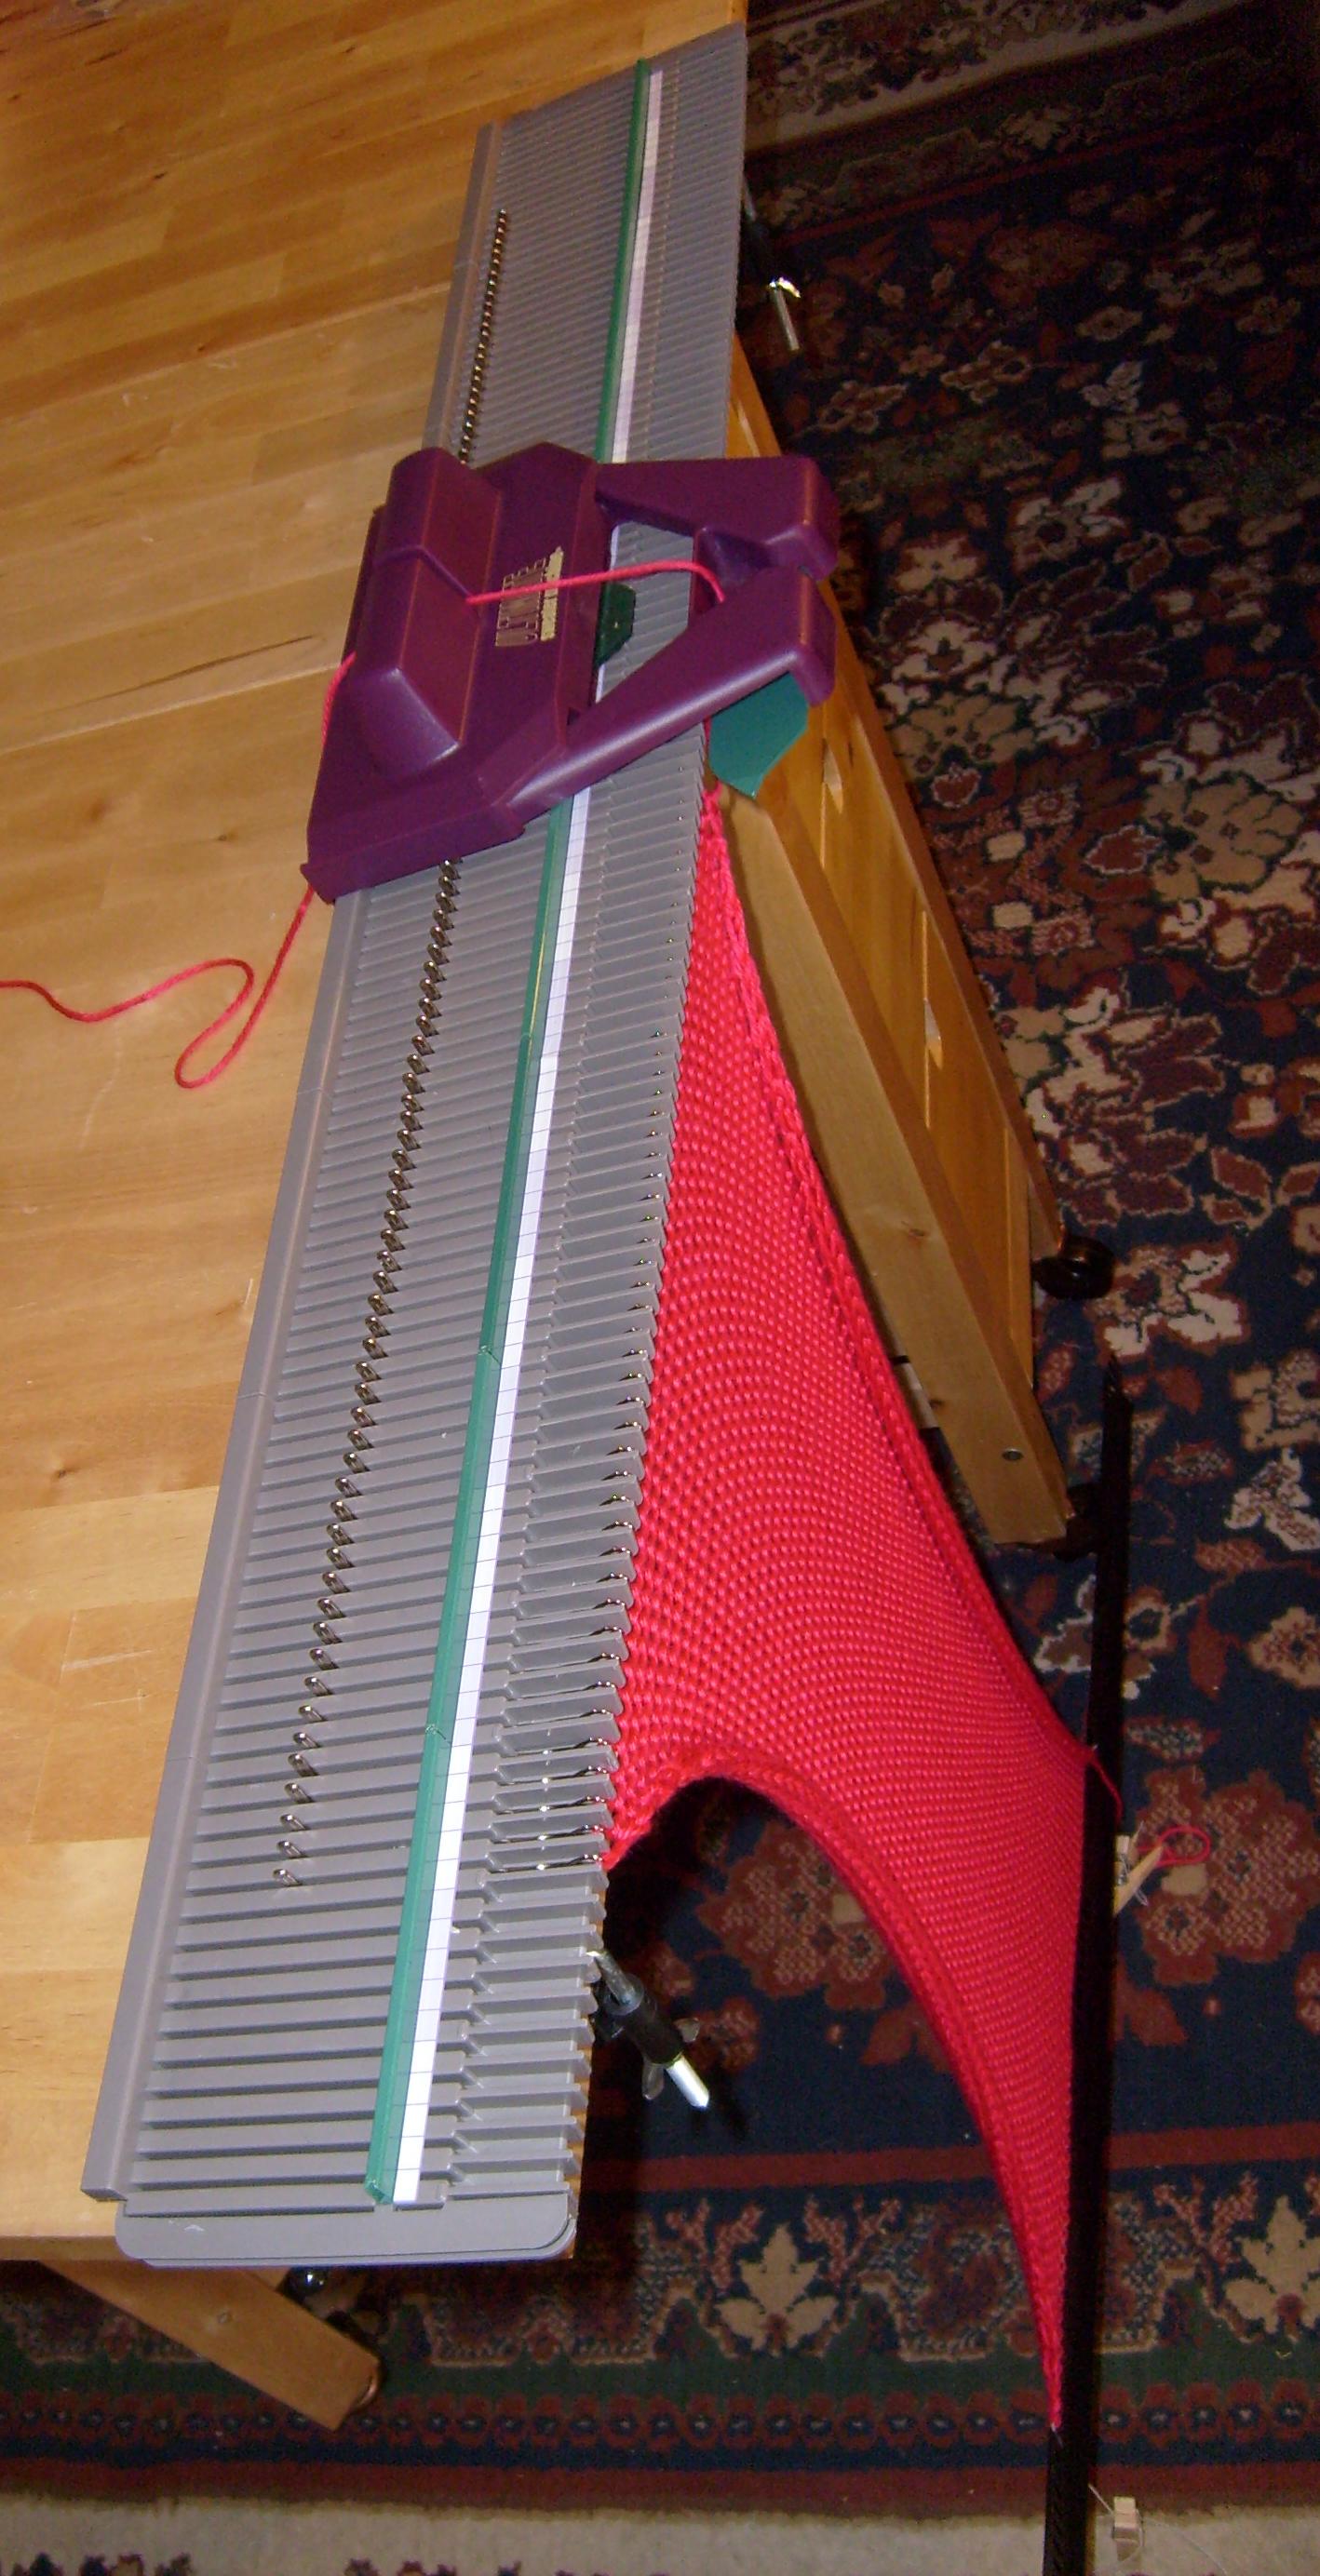 Knitting Machine For Home : File home knitting machine g wikimedia commons